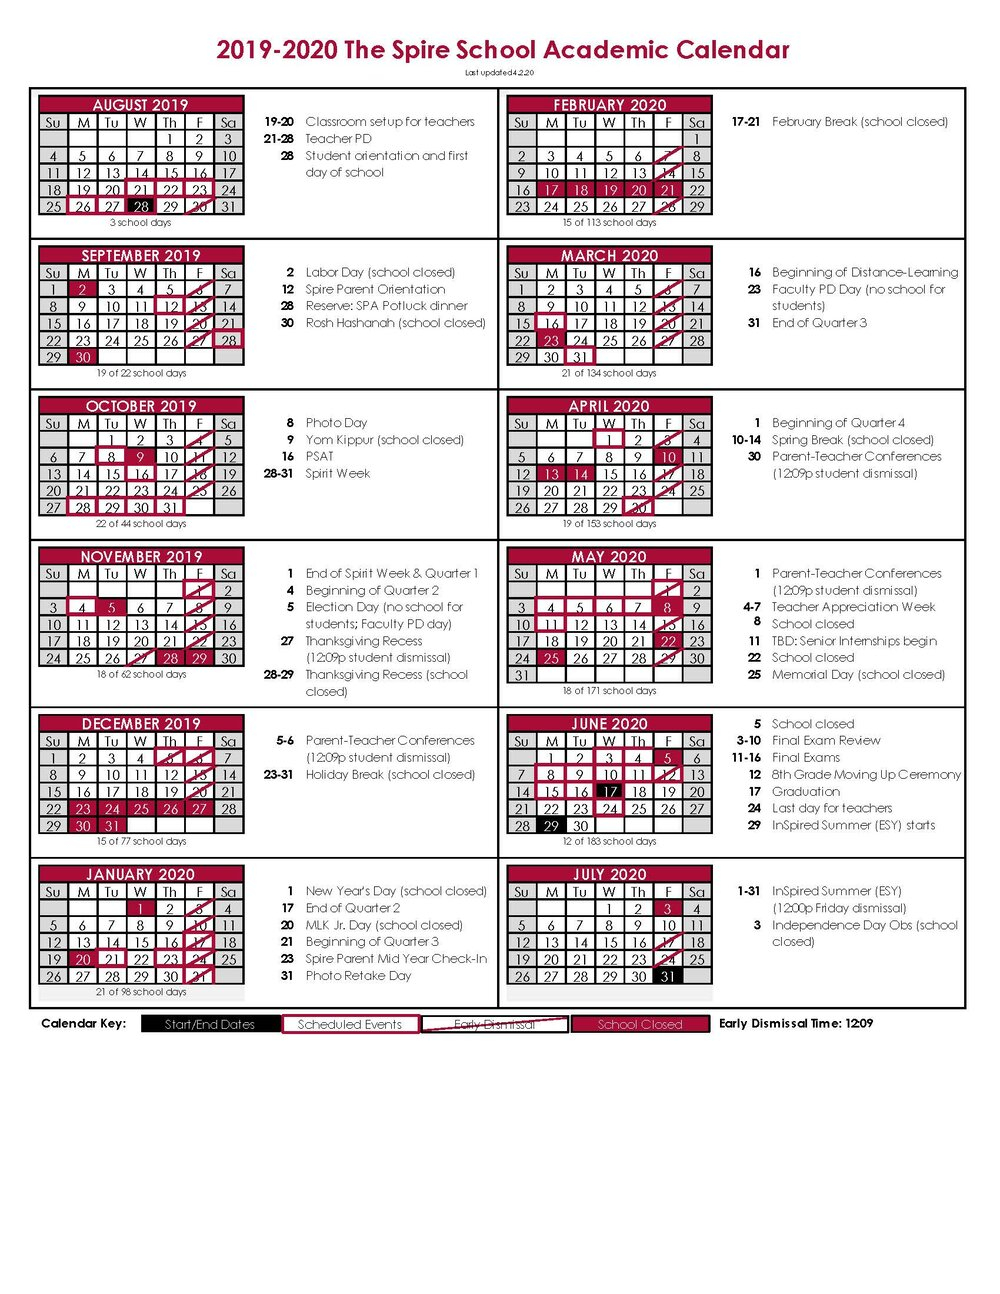 Academic Calendar — The Spire School In College Of Staten Island Spring 2021 Calendar